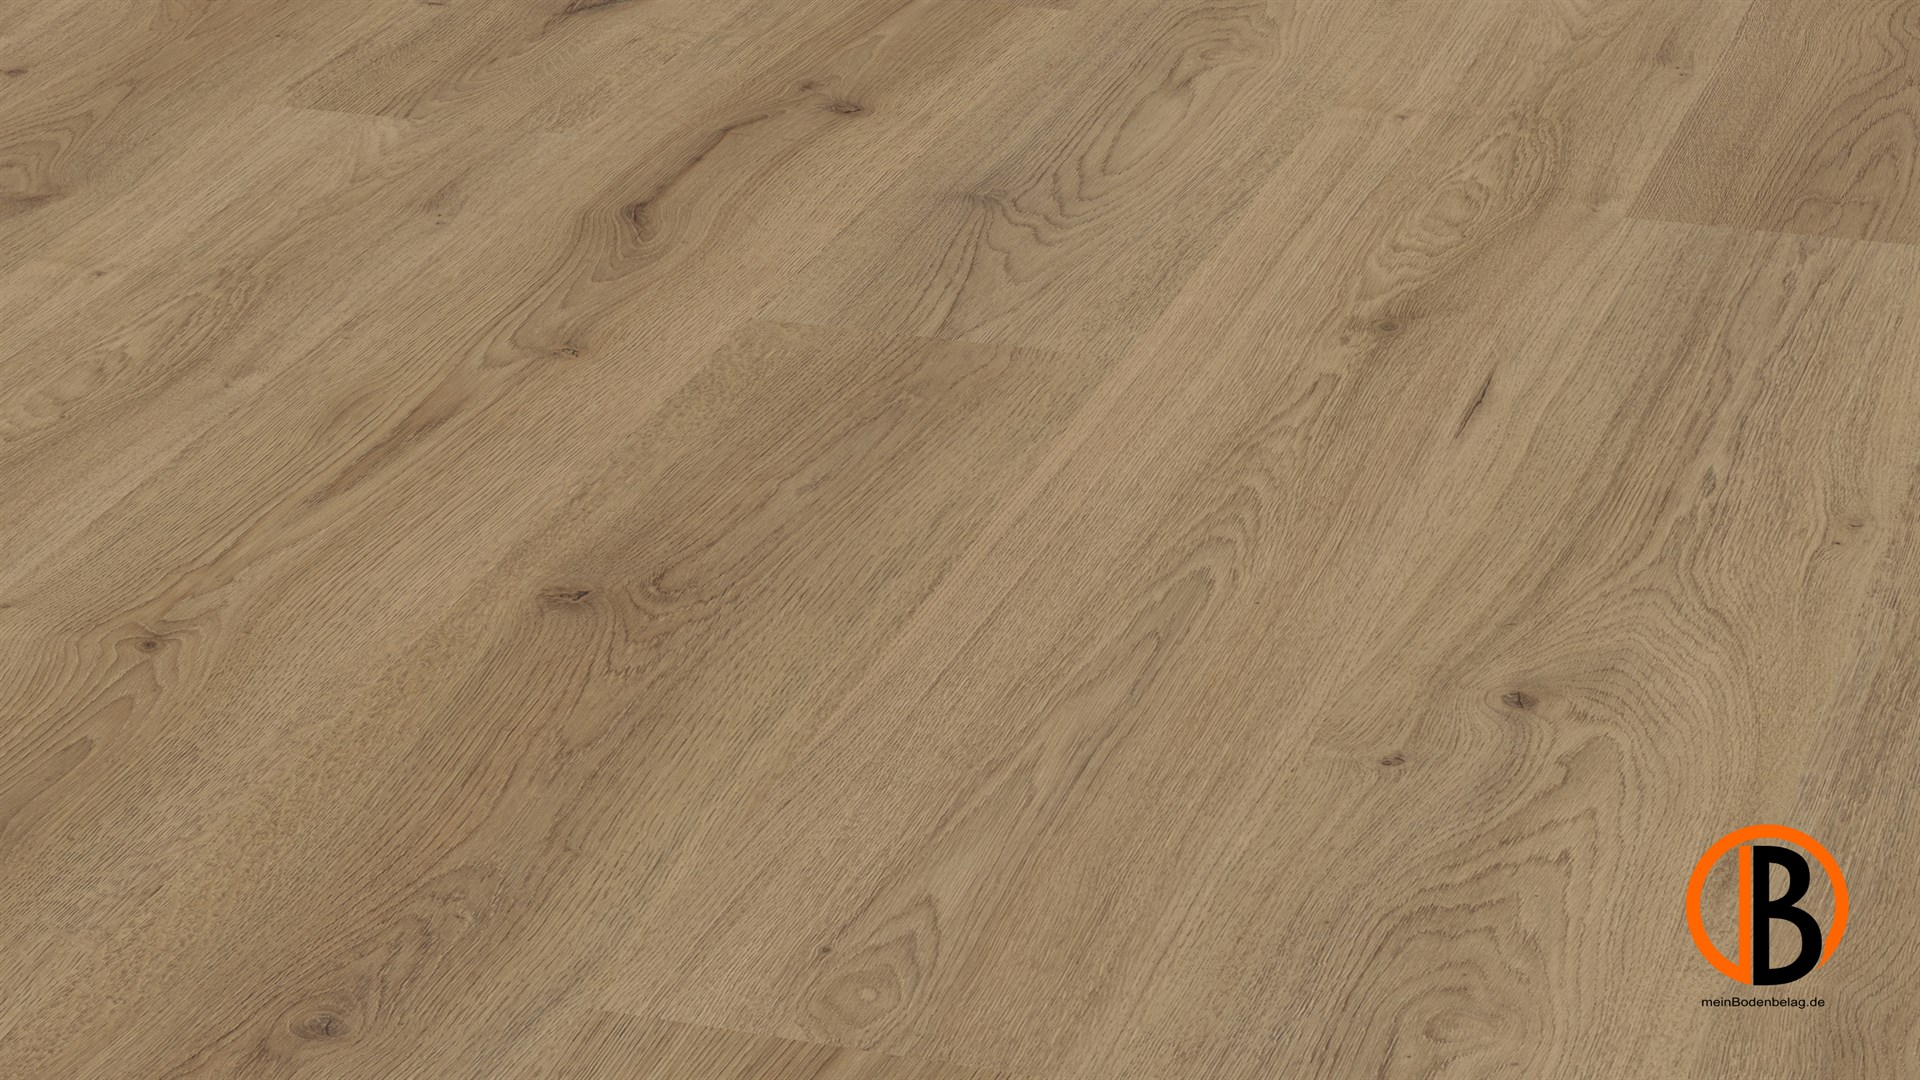 Kronotex Laminat Basic Trend Eiche natur 3125 6x1376x193 mm